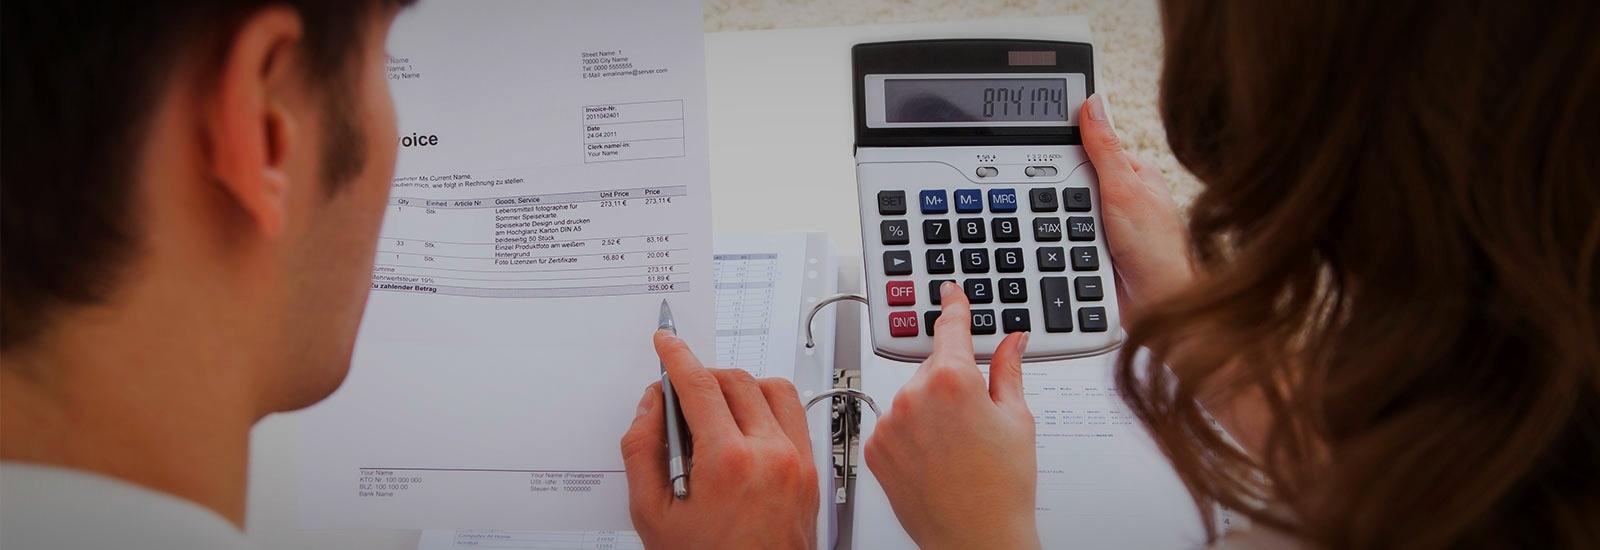 NitroCollege-Website-Title-Blog-Private-Loans-4-500010-edited-4-1